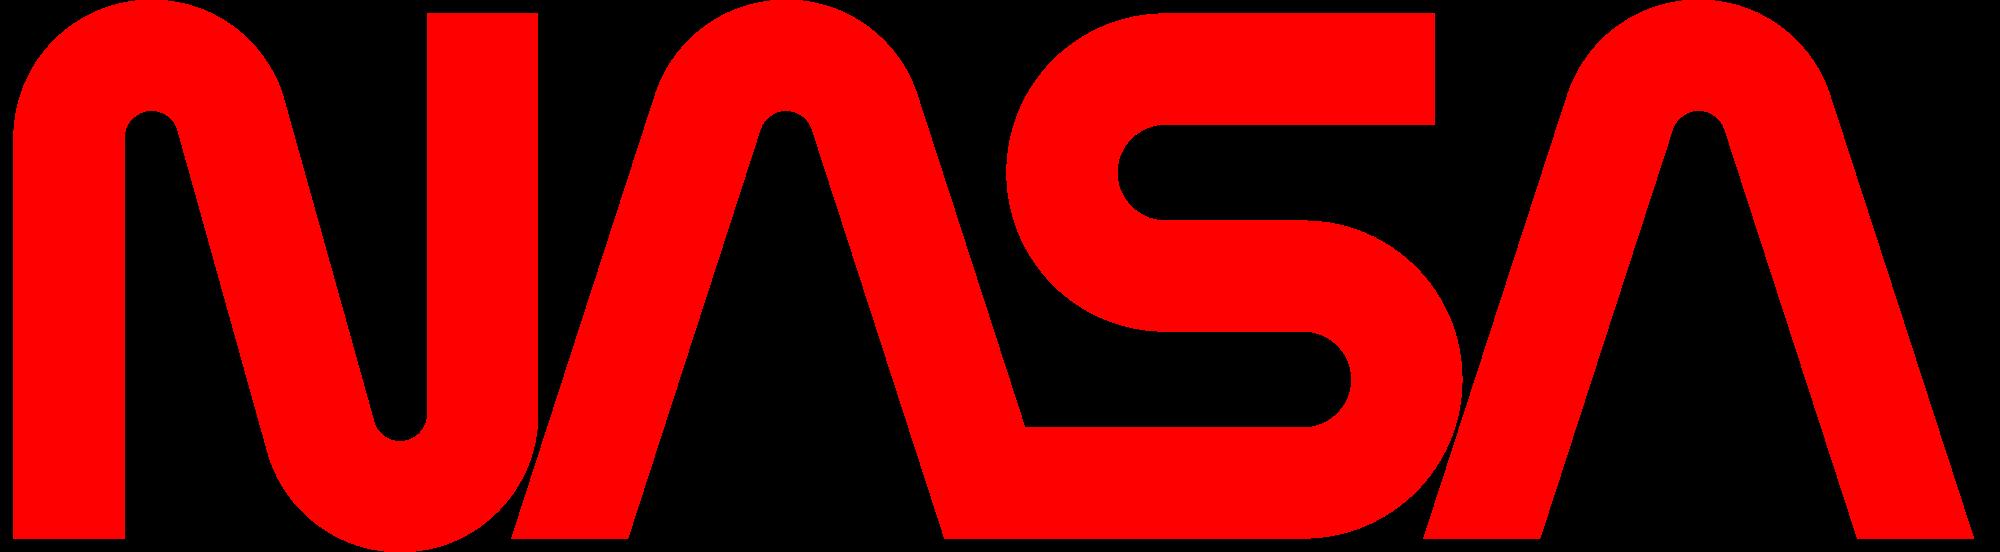 Nasa Logo PNG Transparent Nasa Logo.PNG Images..